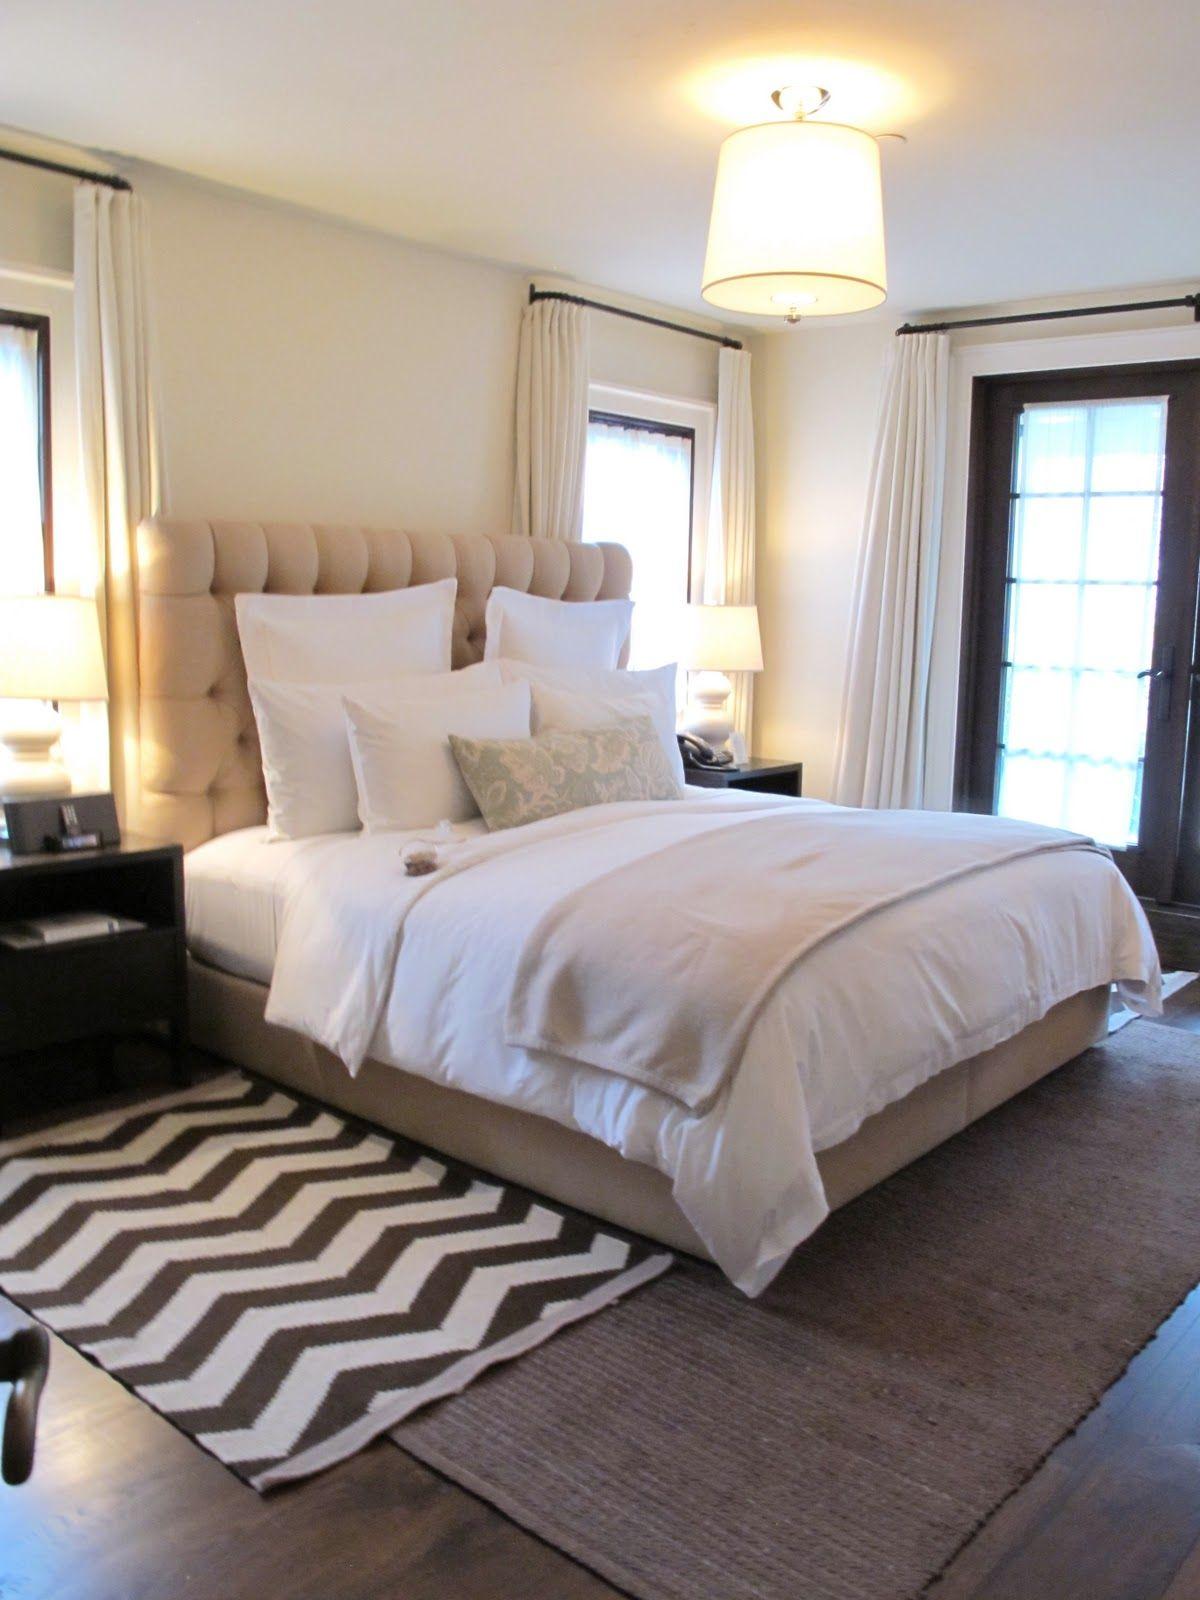 Bedford Post Inn Our Trip To New York Travel Master Bedroom Design Remodel Bedroom Beautiful Bedrooms Master